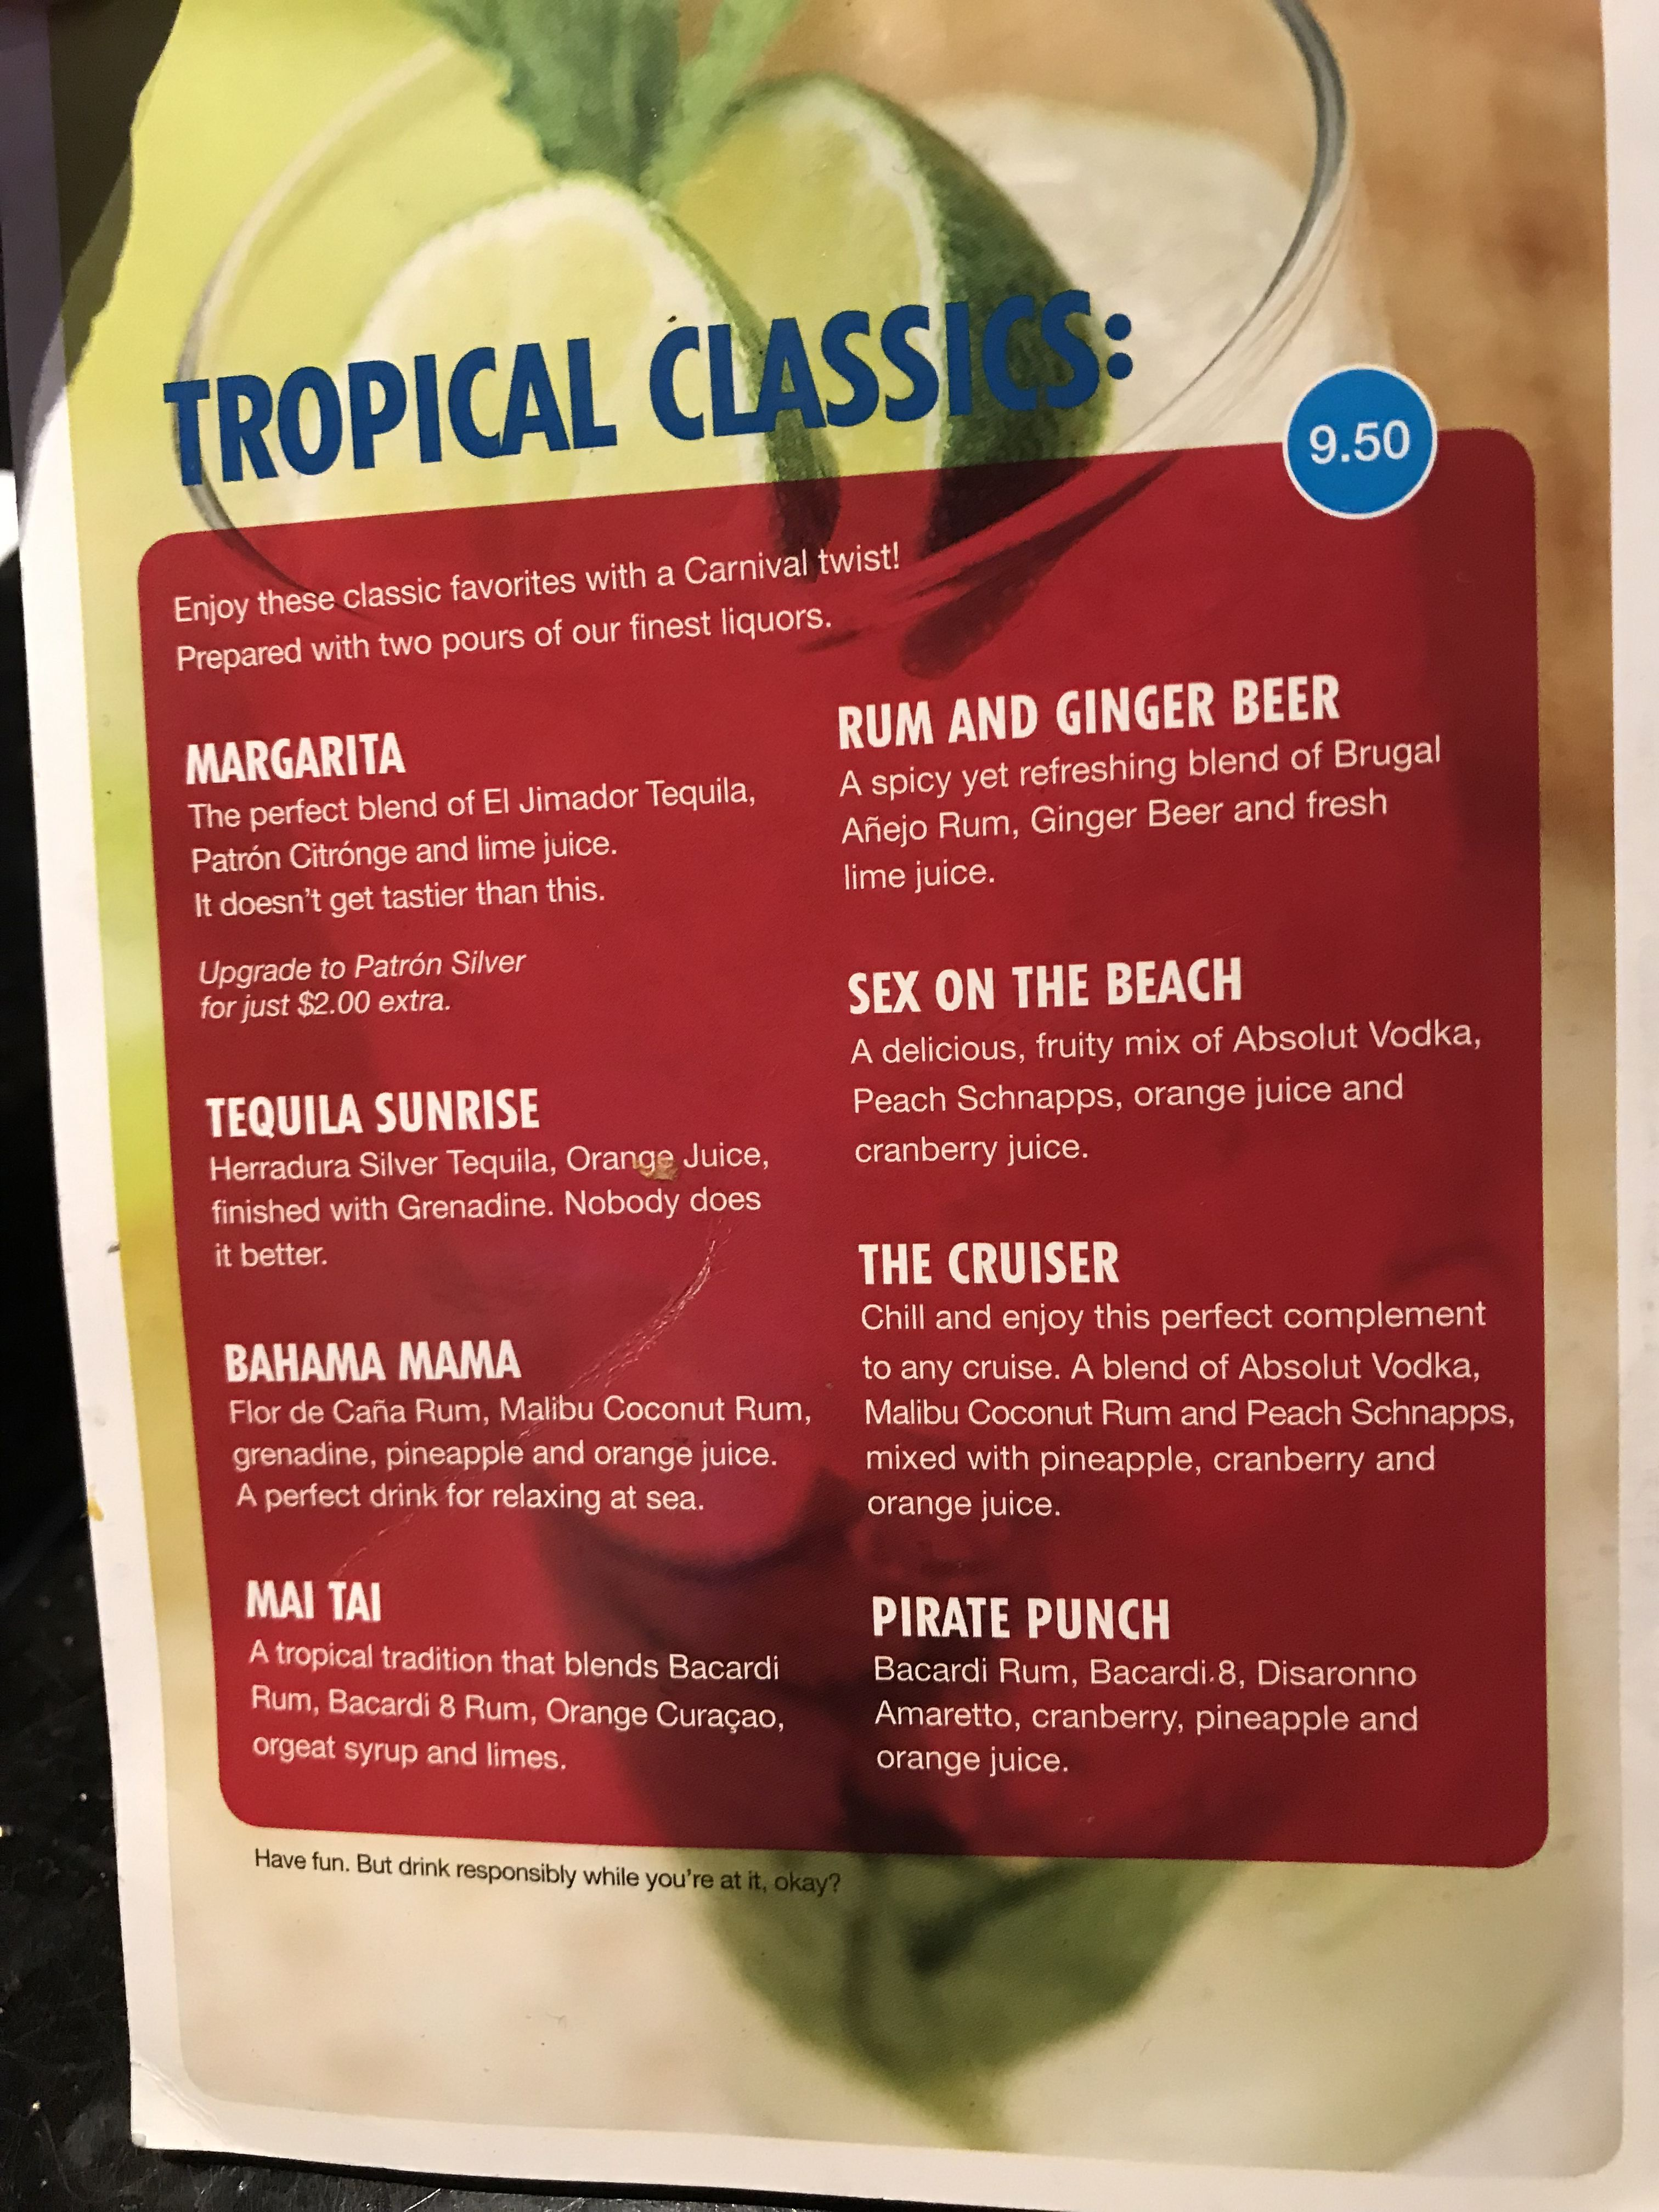 2019 Carnival Glory tropical classics drink menu   Drink ...